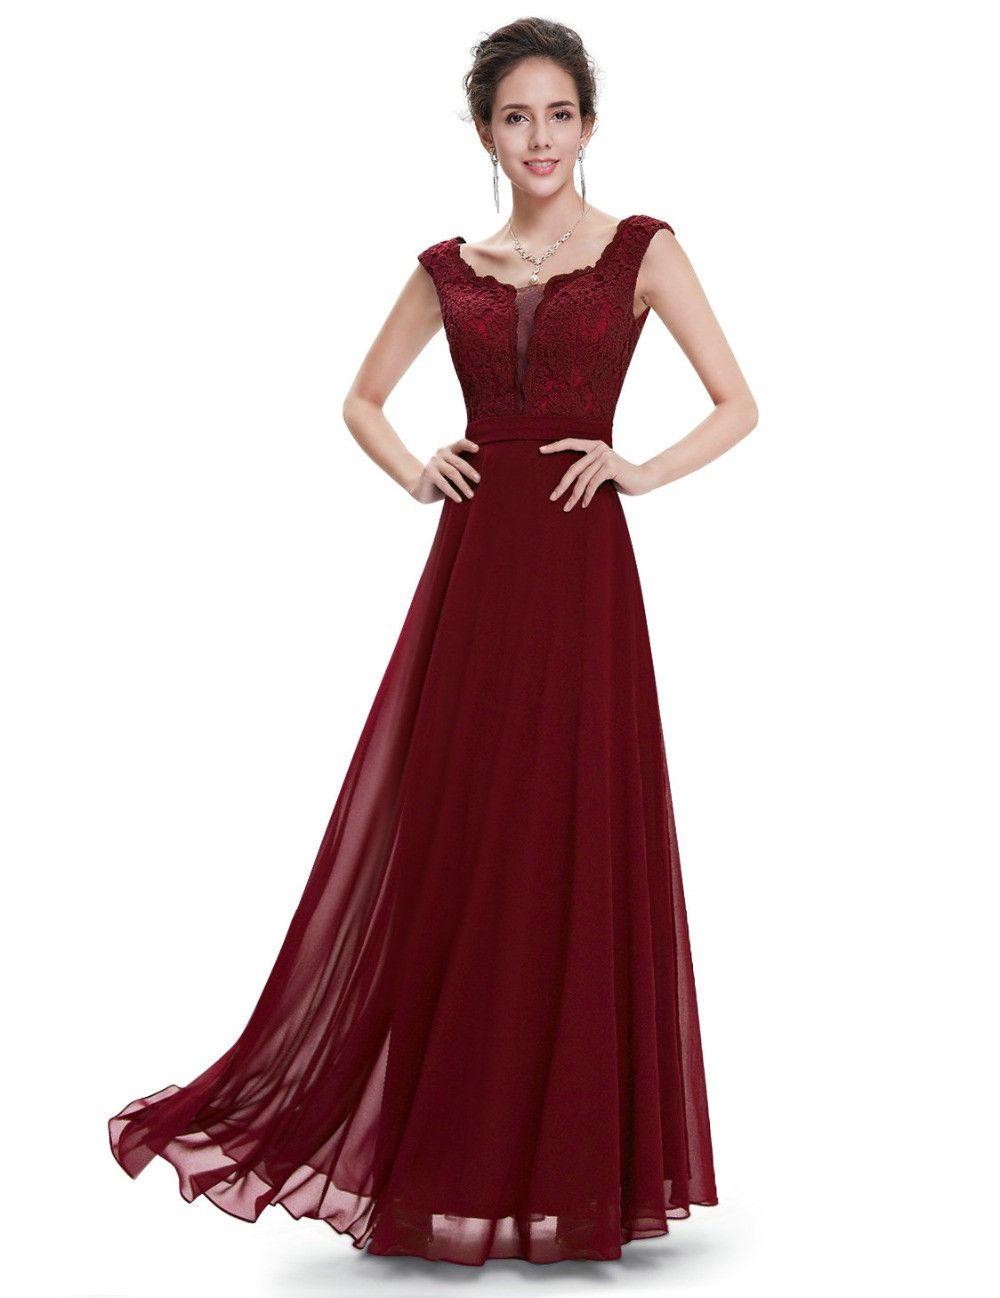 b6775d234d Modest Burgundy Prom Dresses 2017 Fitted Prom Dress Long Evening ...